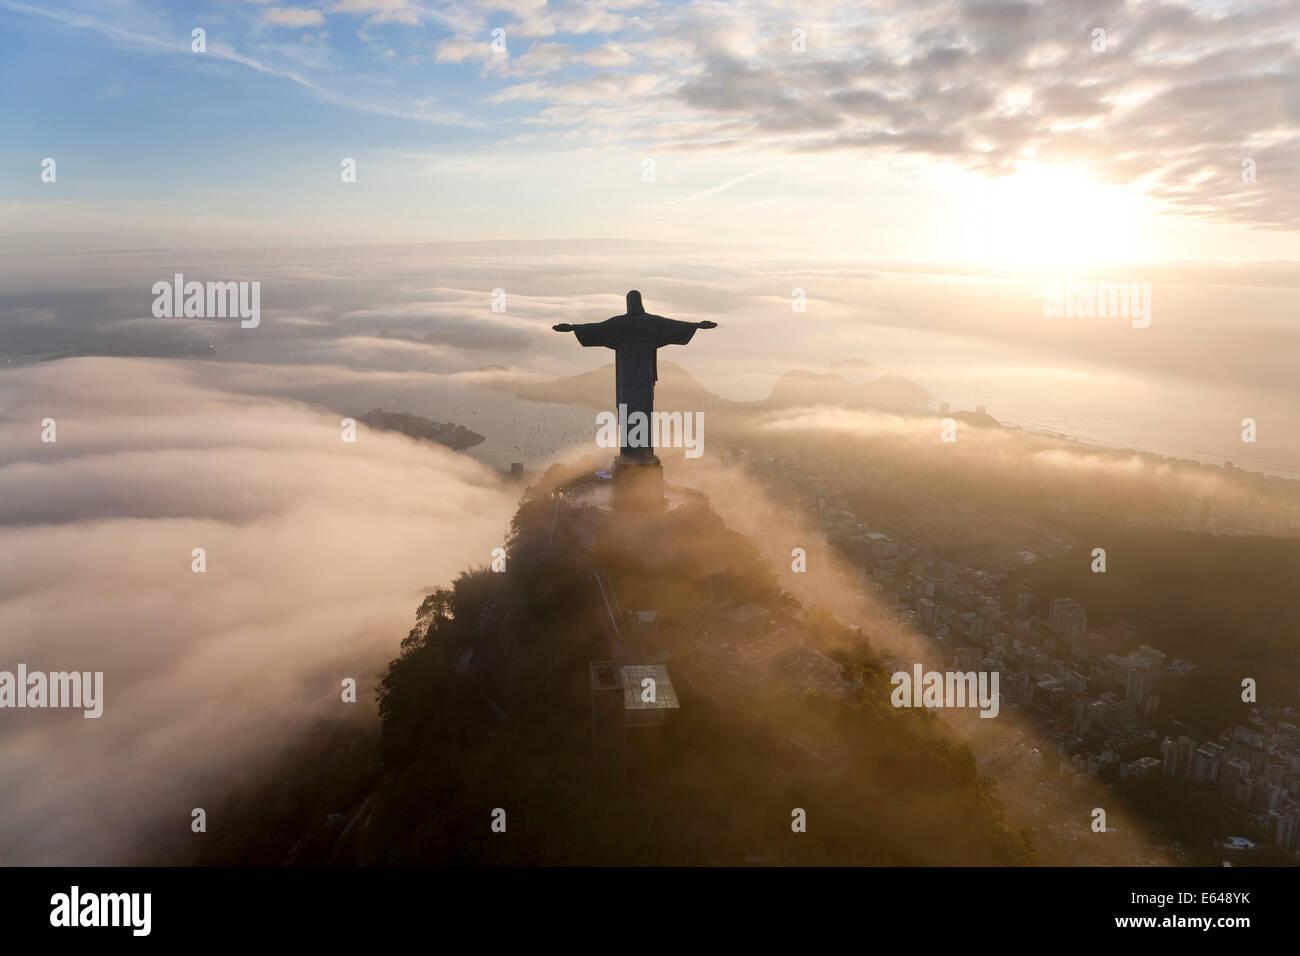 Die riesigen Art-Deco-Statue Jesus Cristo Redentor (Christus Erlöser) auf dem Berg Corcovado in Rio De Janeiro Stockbild